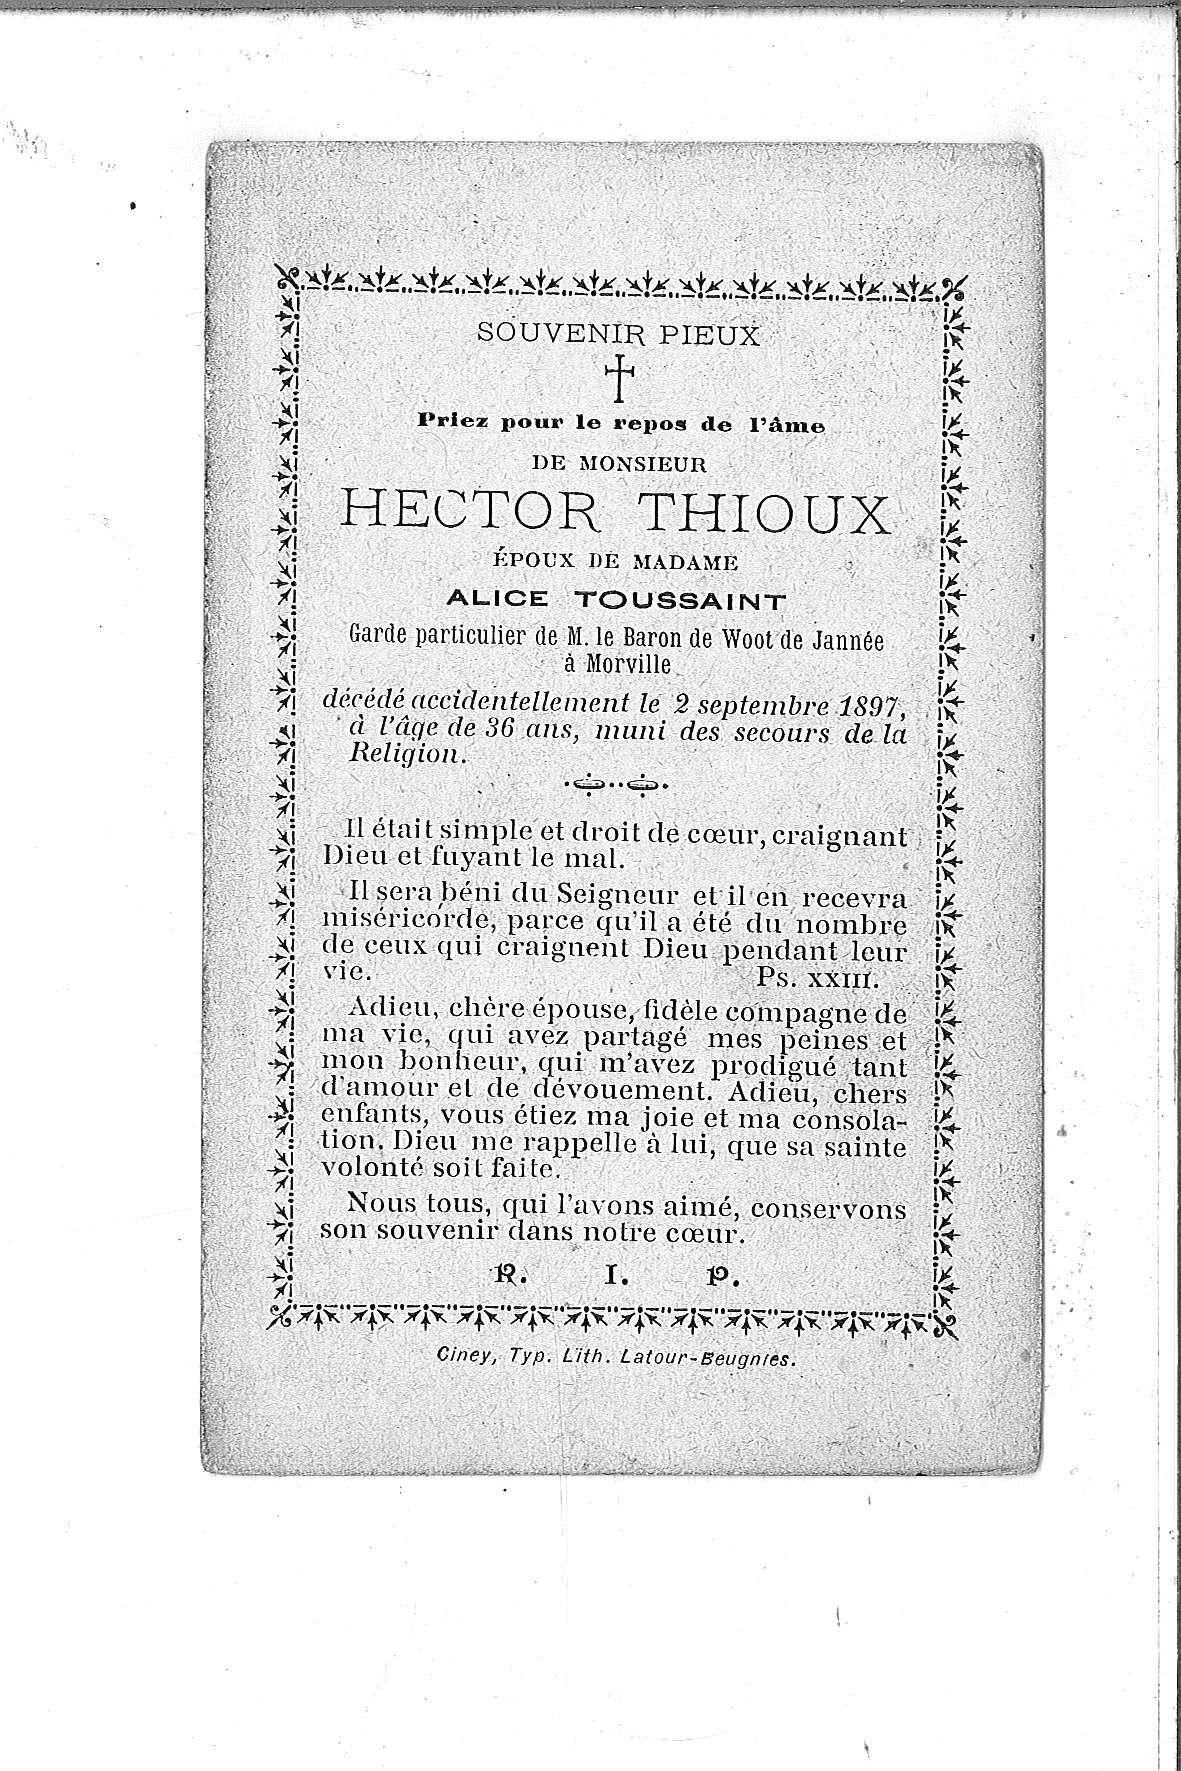 Hector(1897)20140825083222_00142.jpg